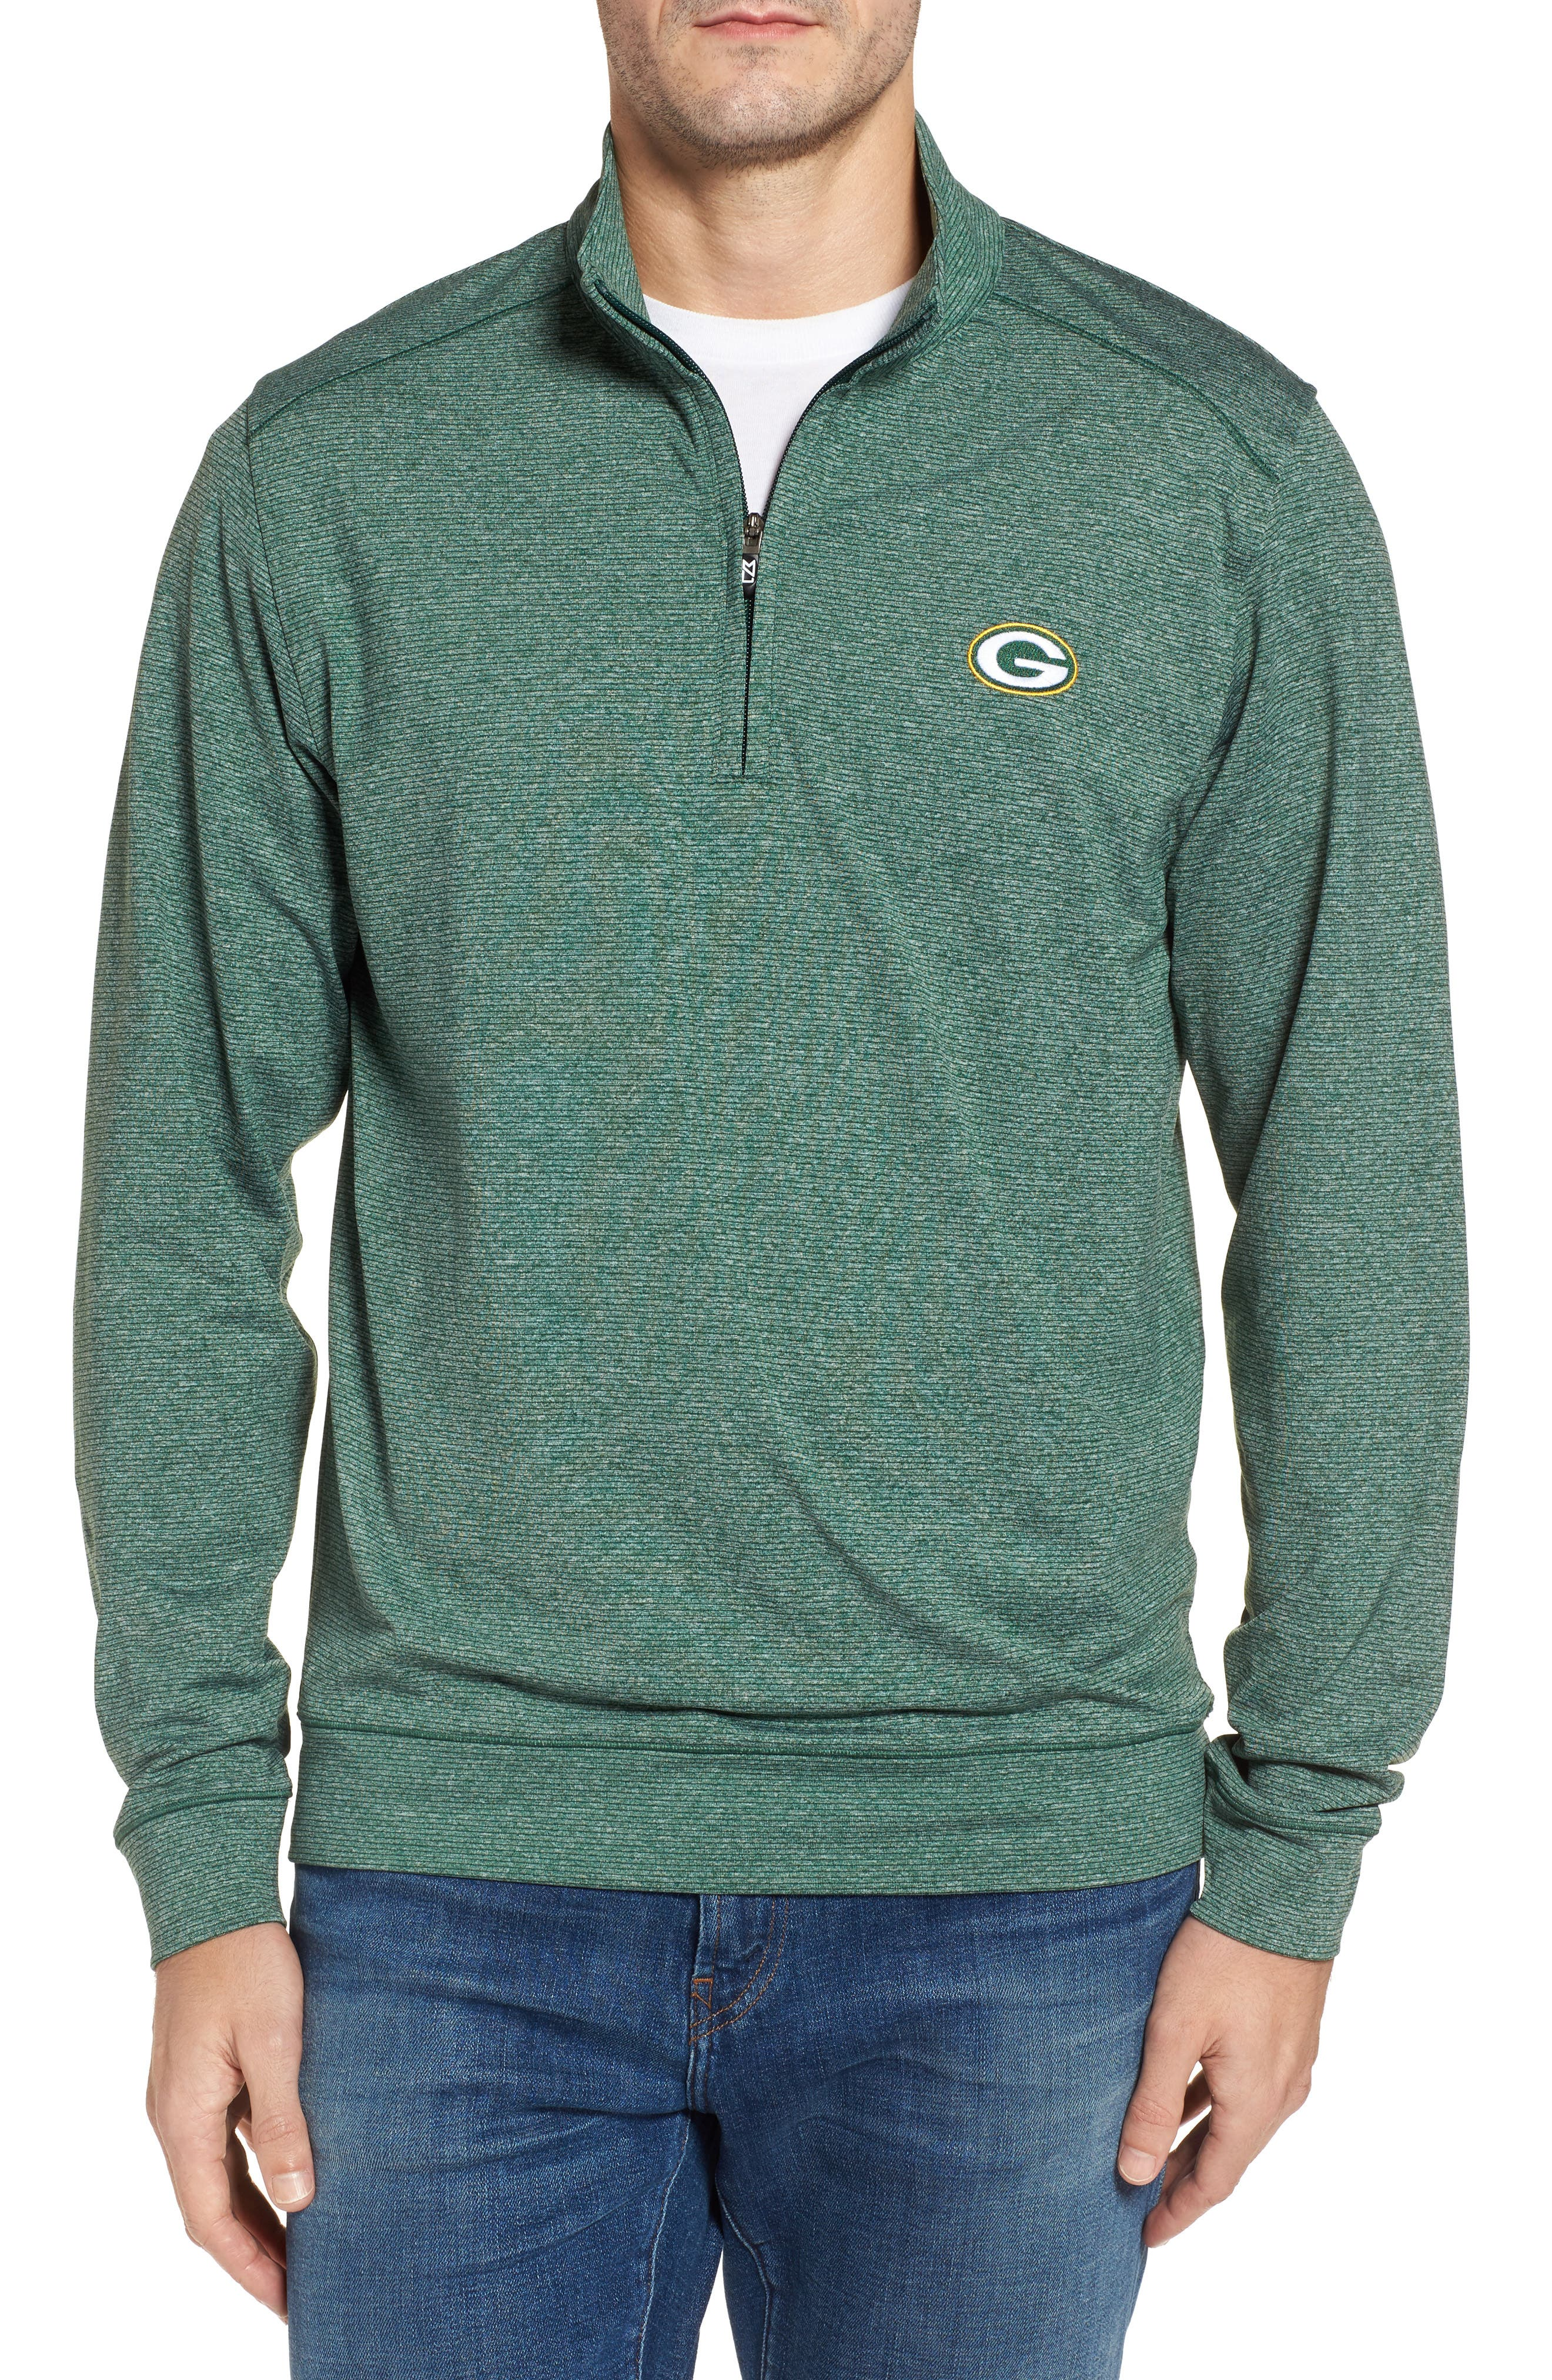 Main Image - Cutter & Buck Shoreline - Green Bay Packers Half Zip Pullover